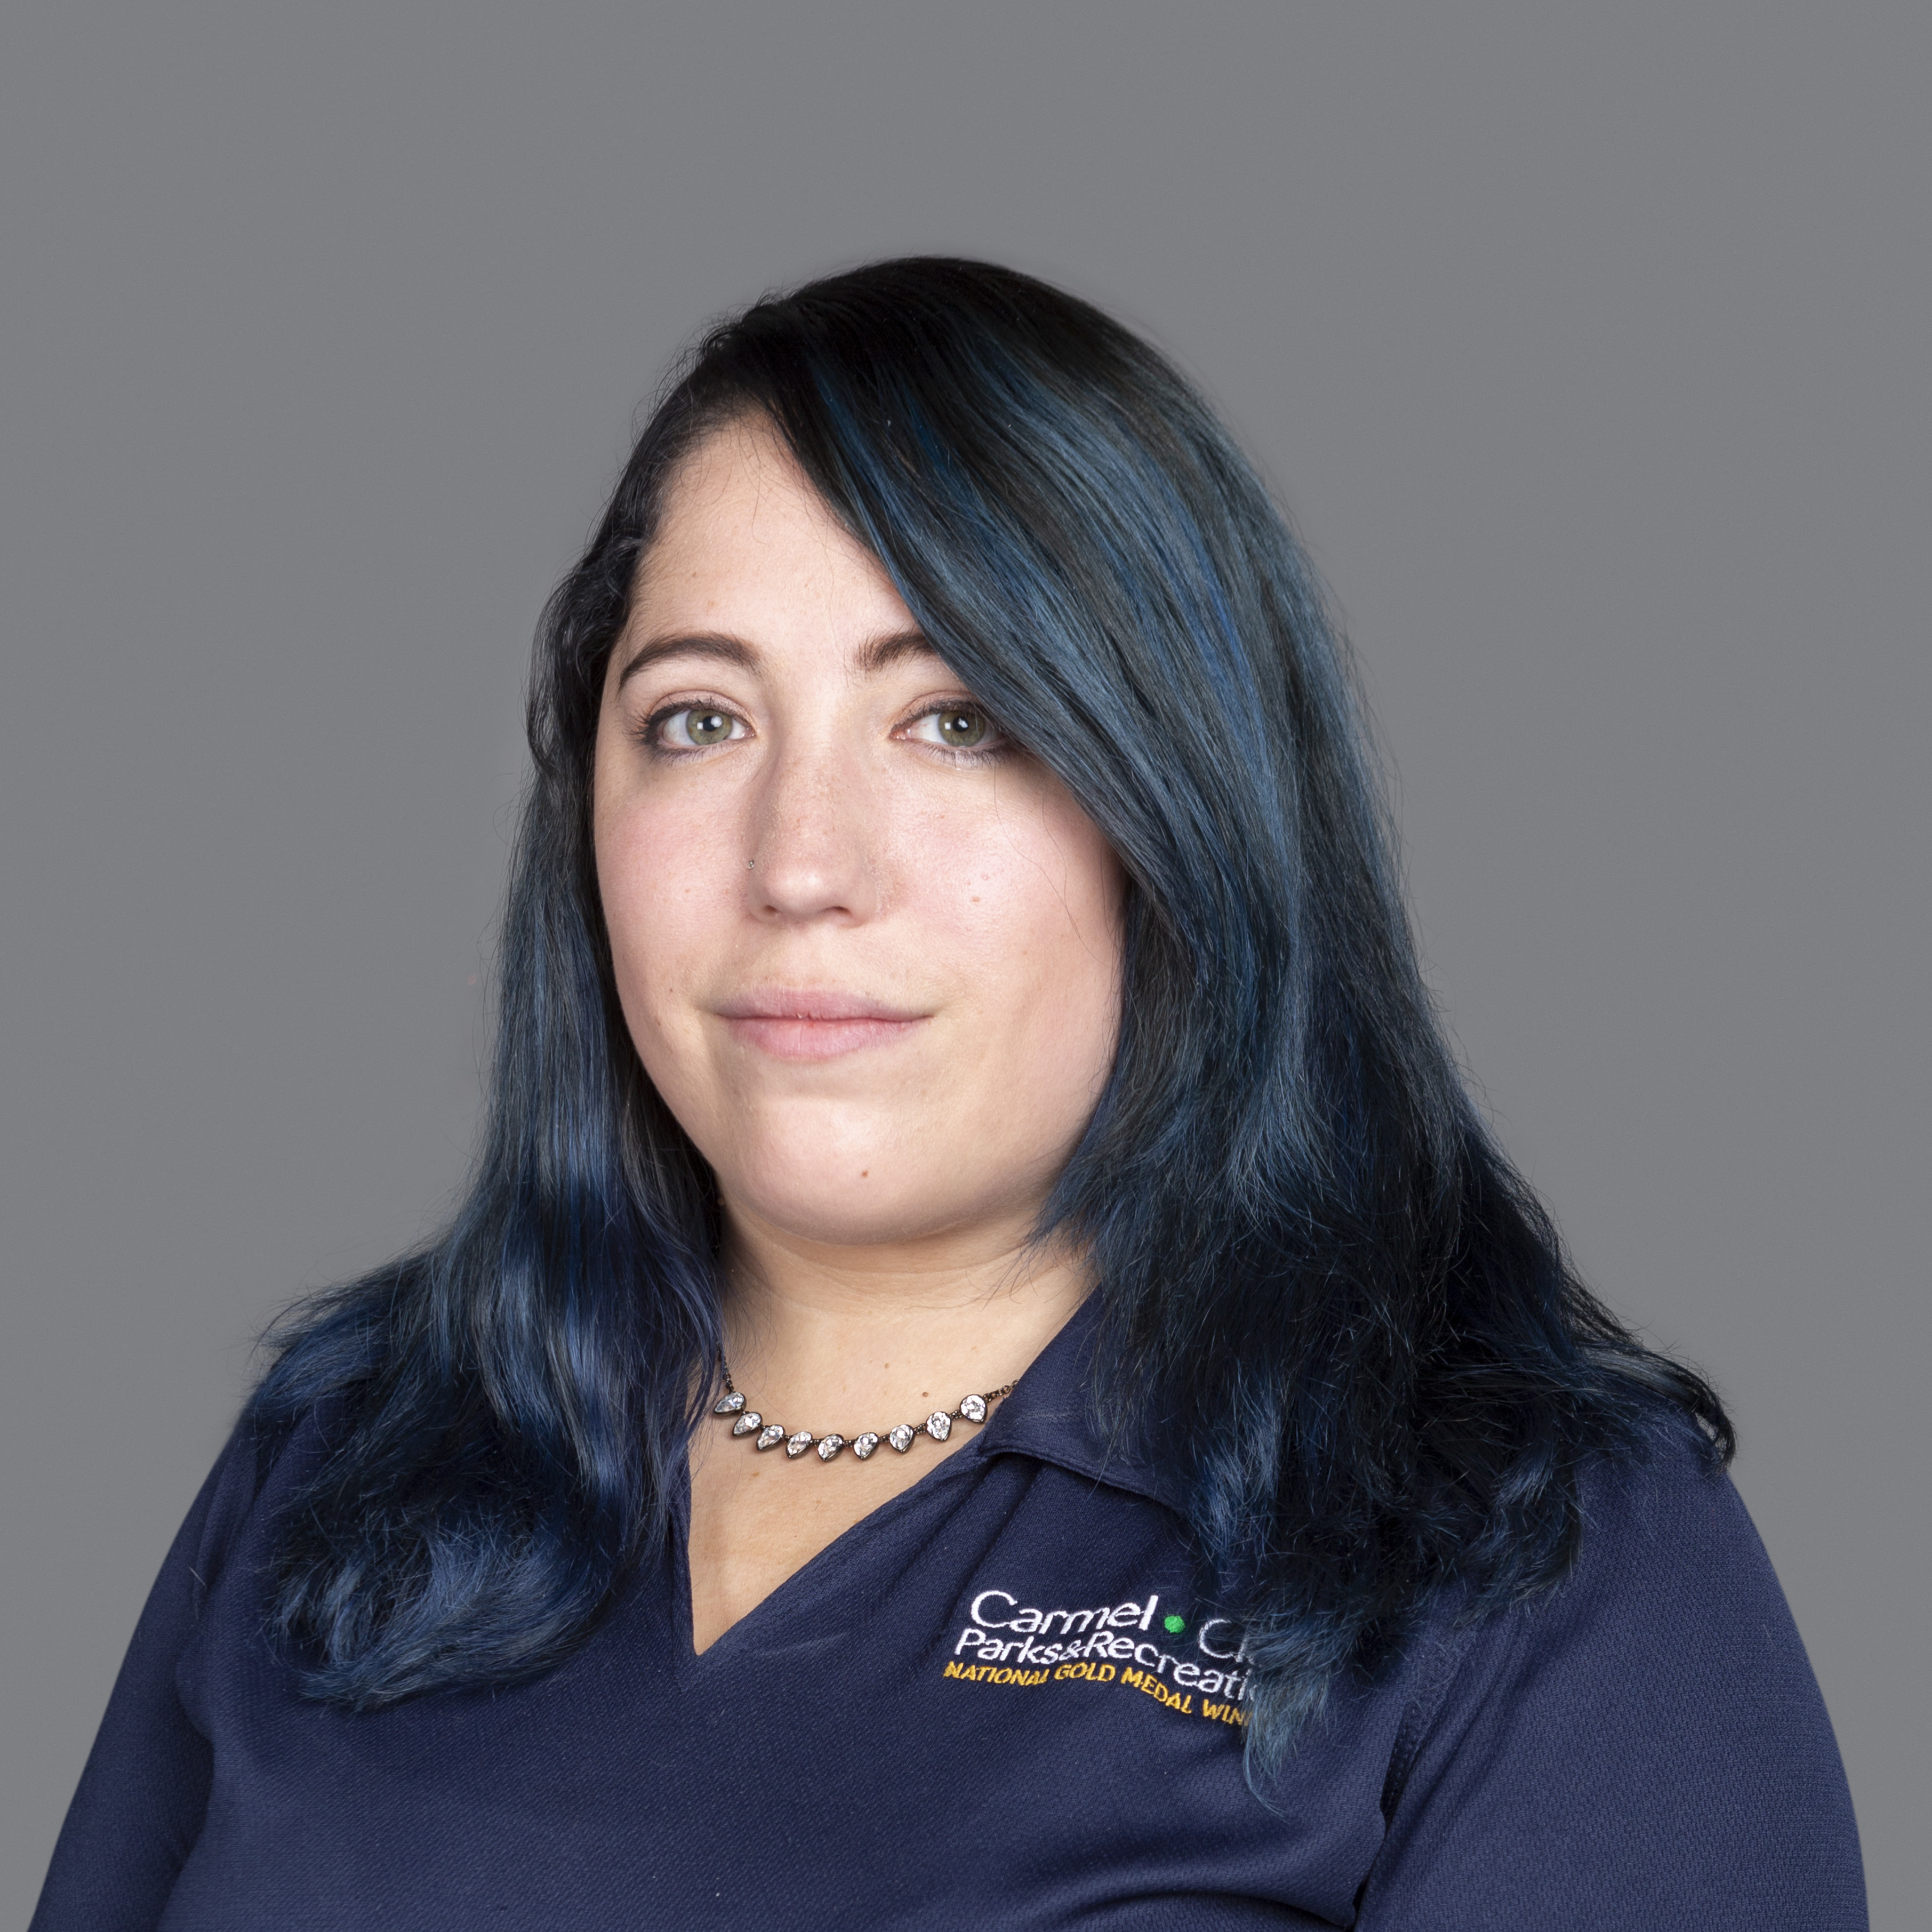 Felicia Diaz